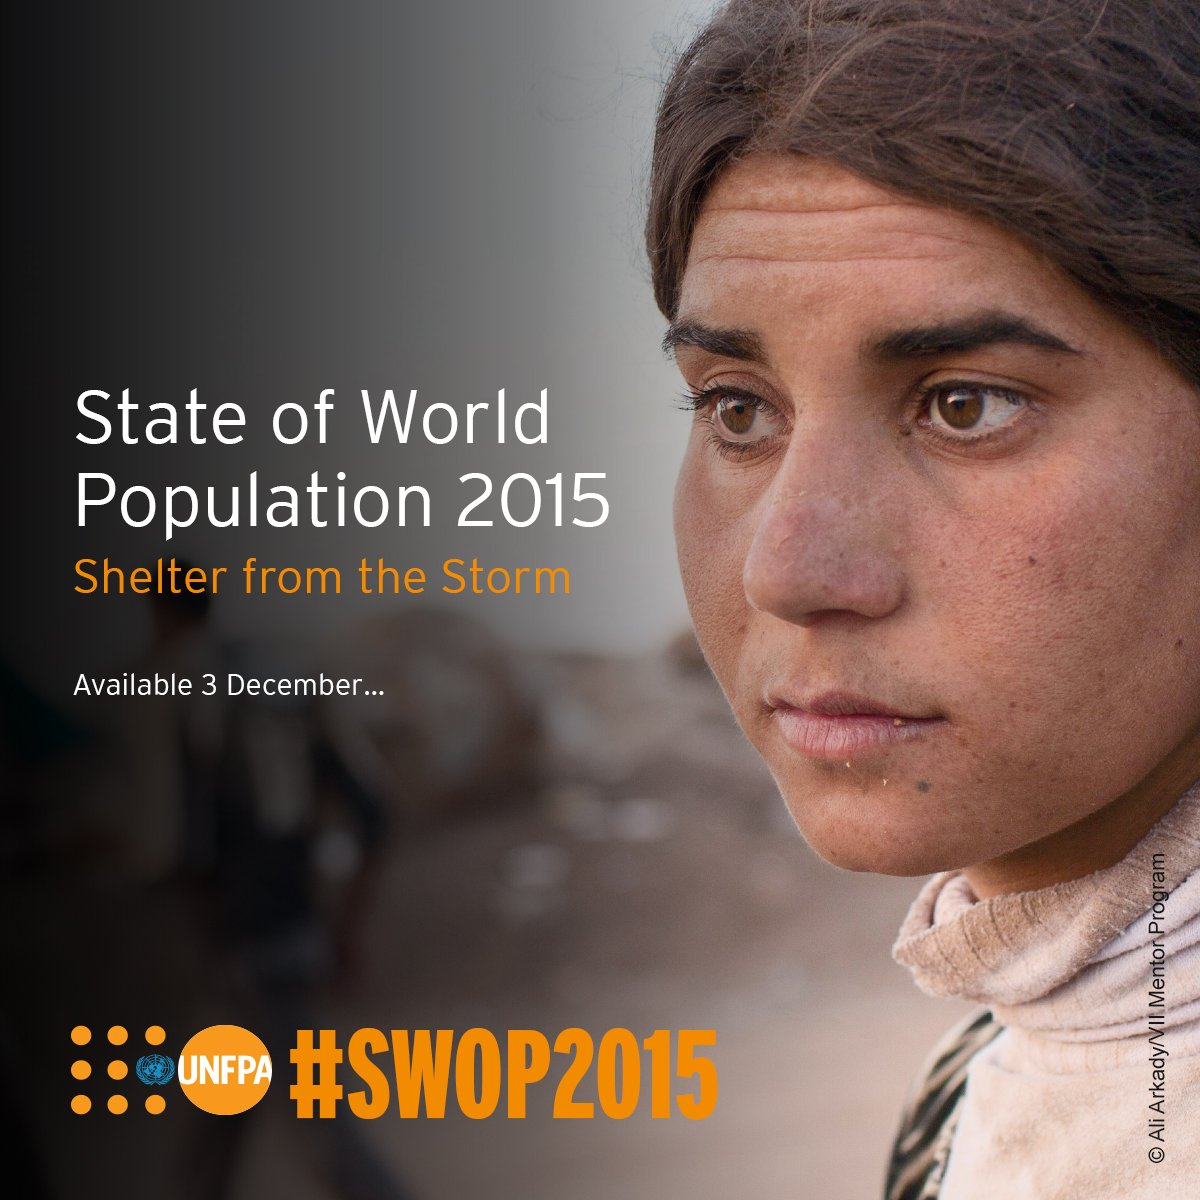 Thumbnail for #SWOP2015 RECAP